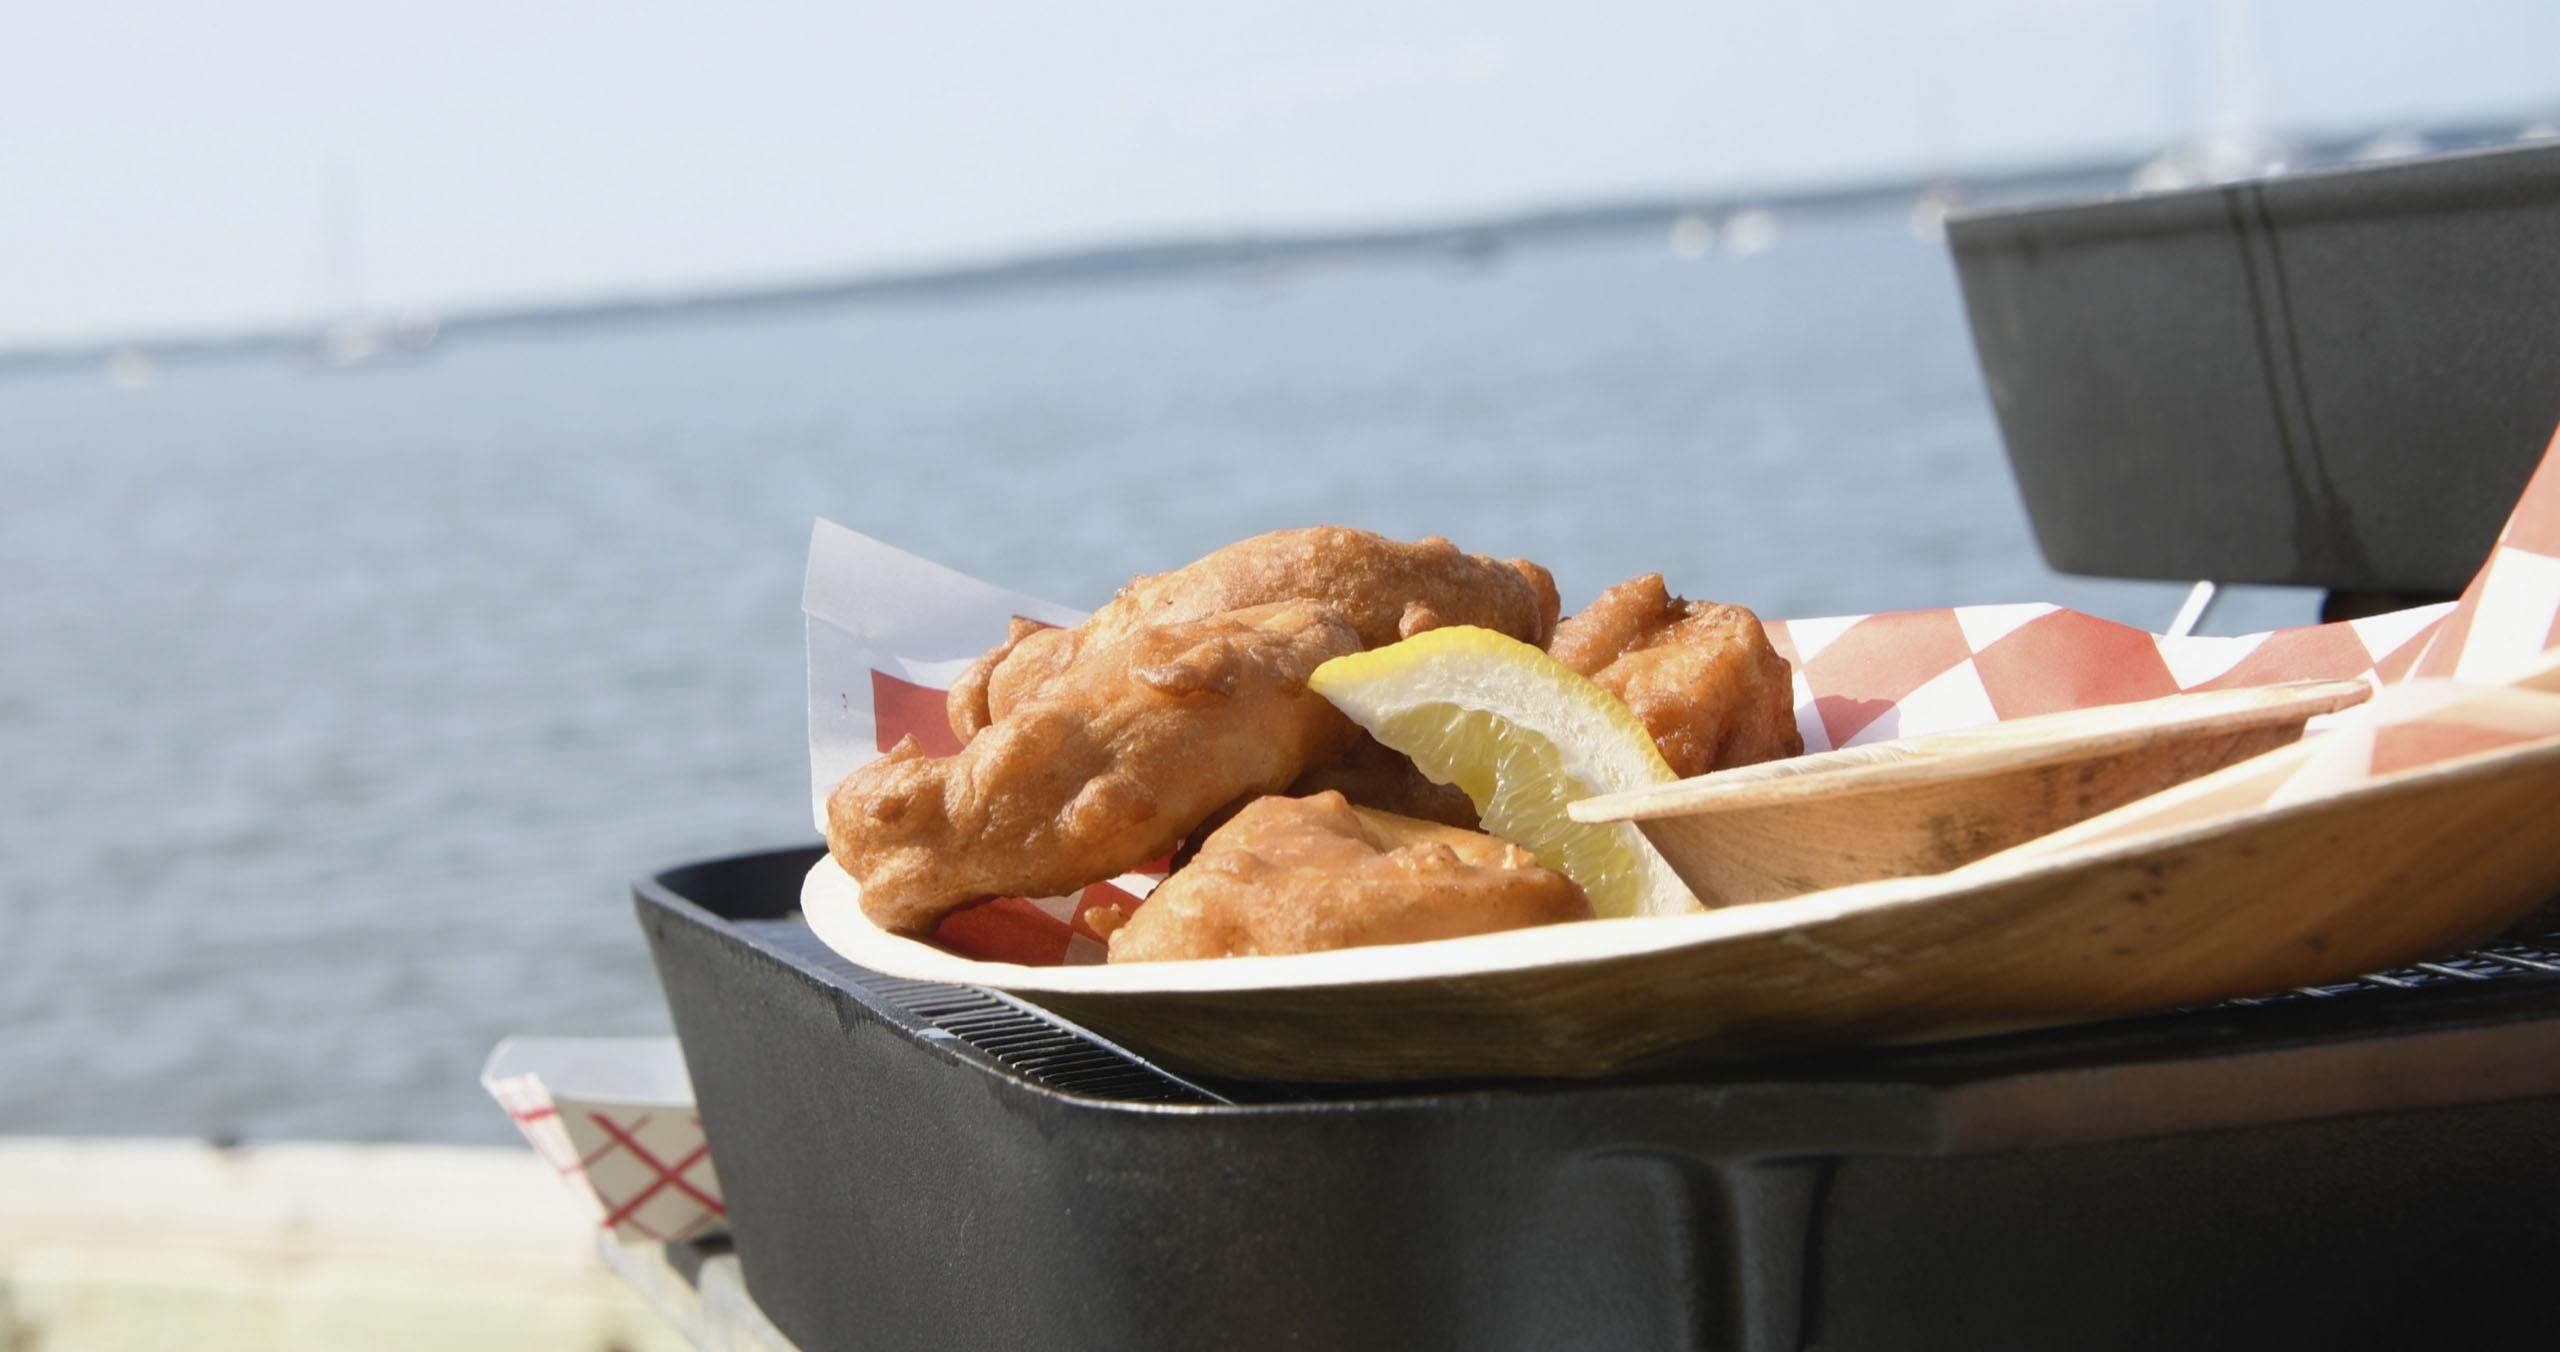 Waterside at Cormaria in Sag Harbor with beer batter fish.